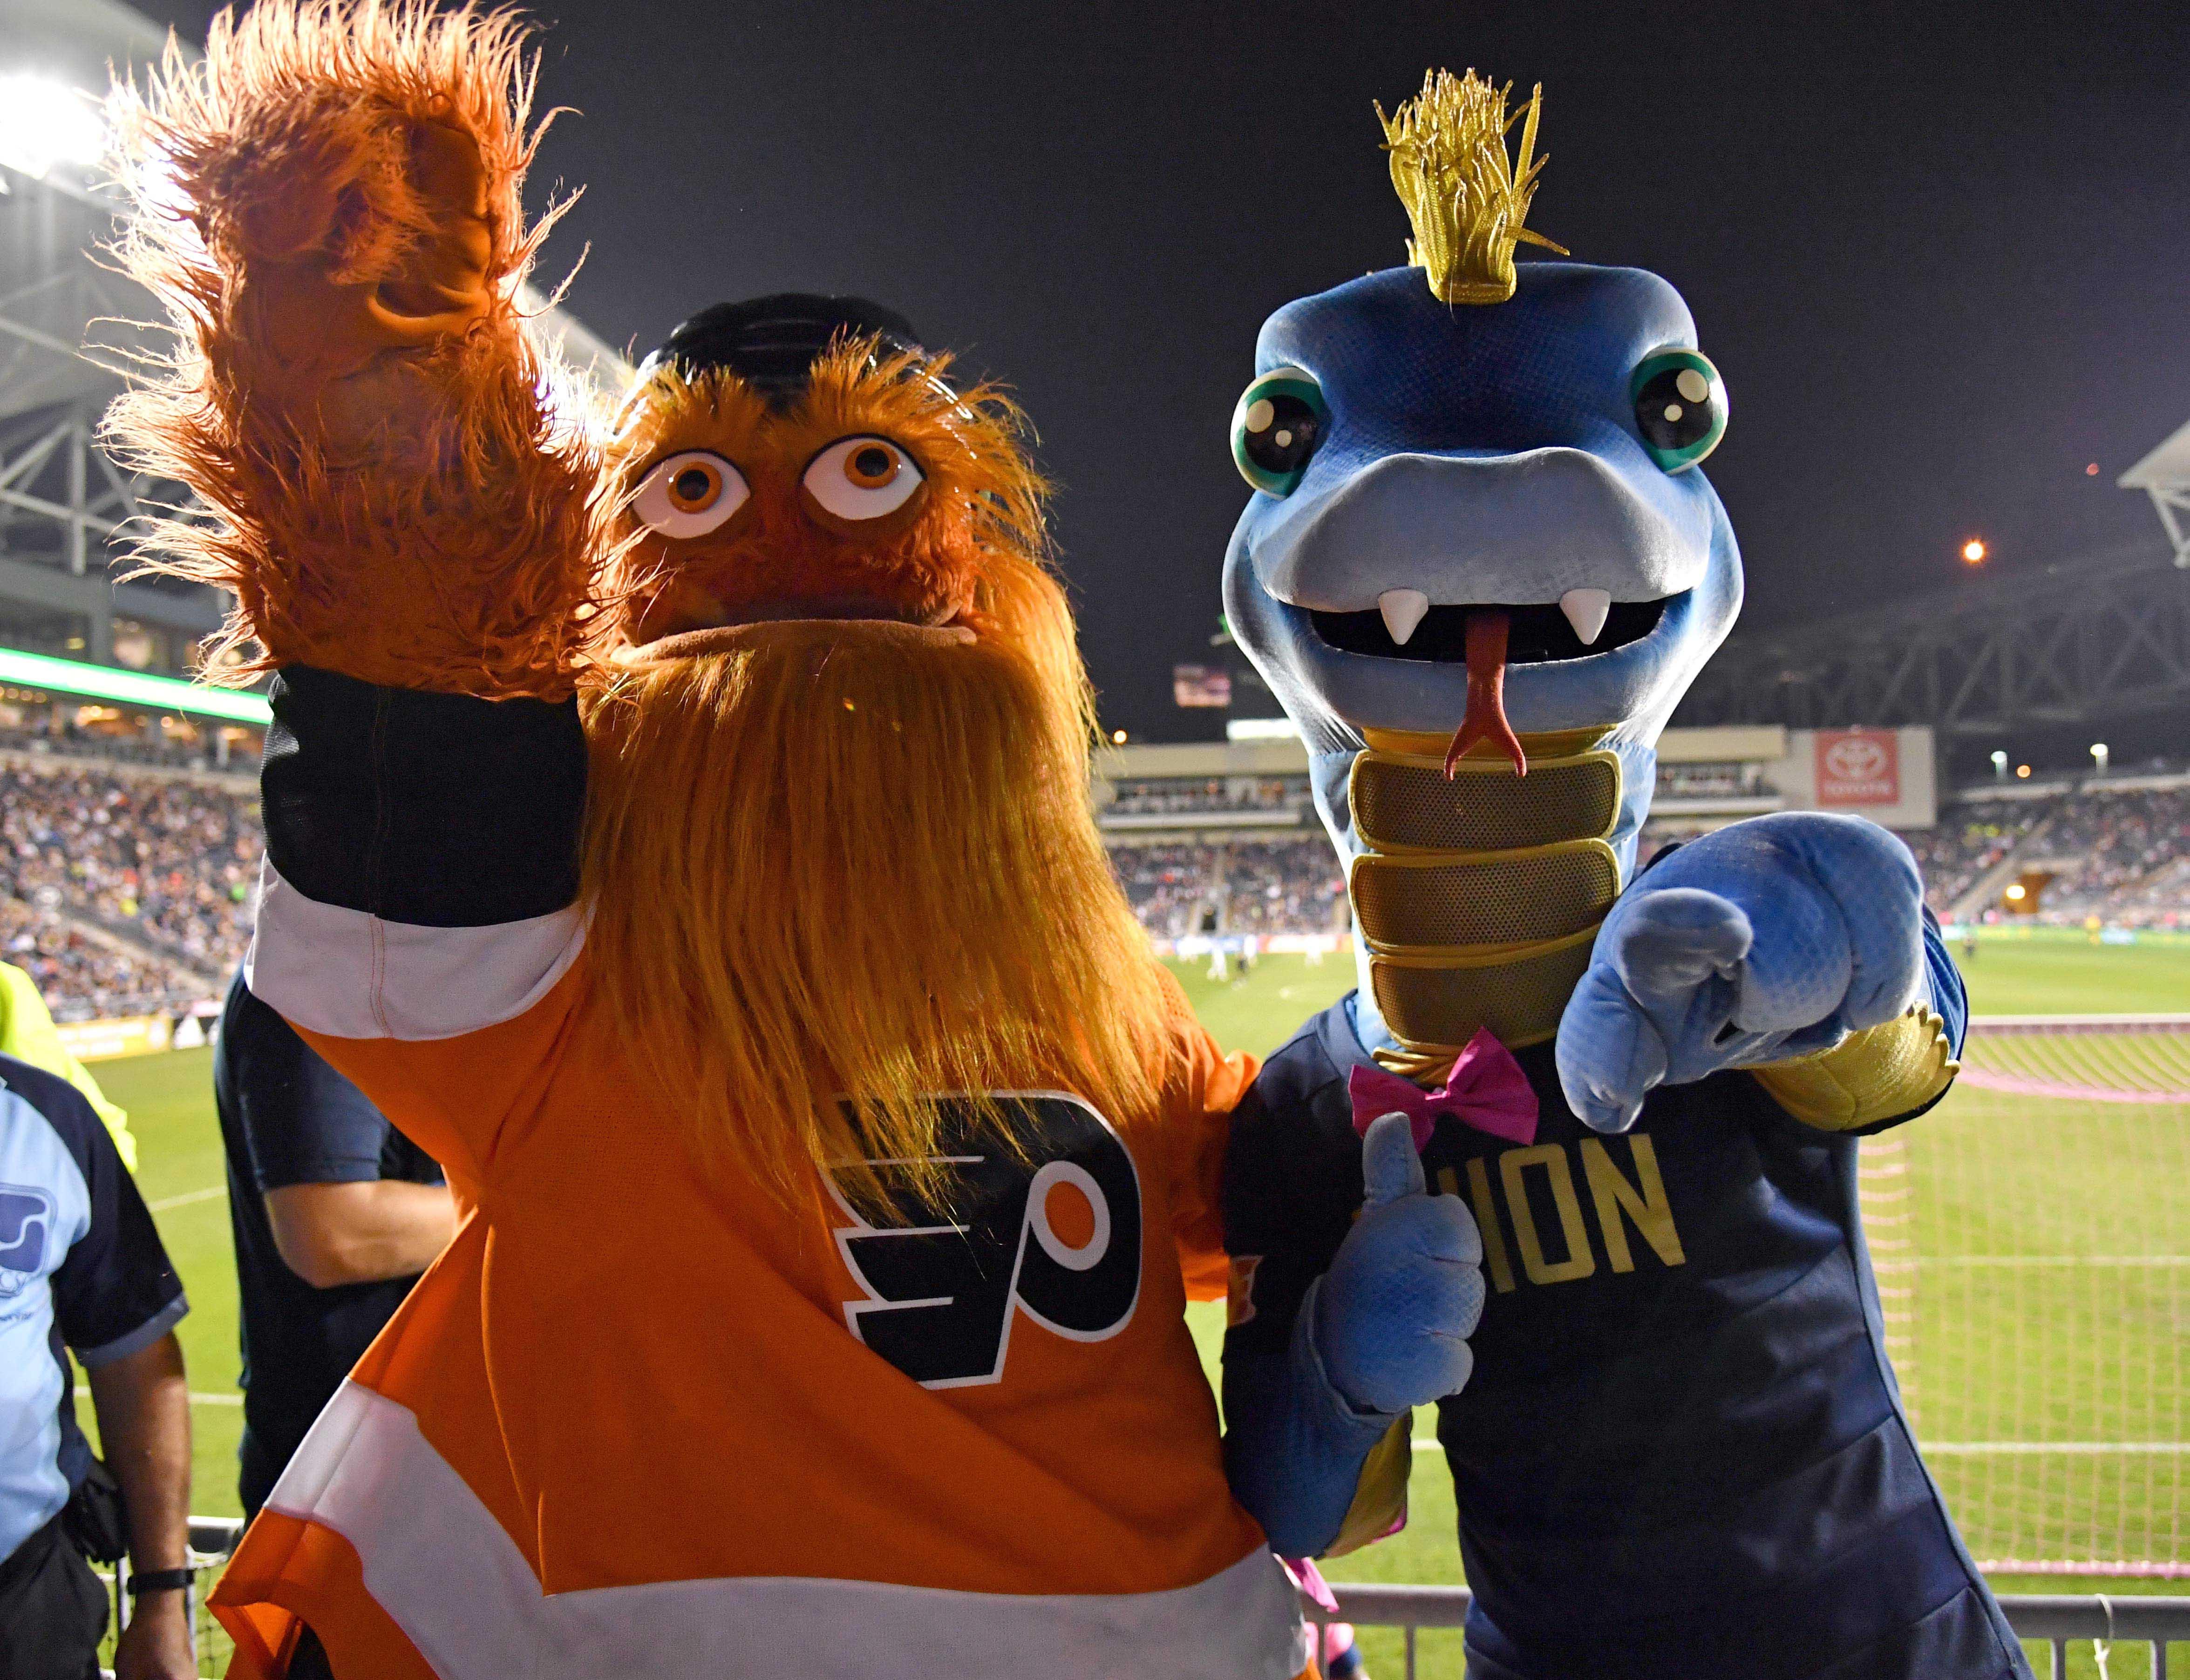 Oct 6, 2018; Philadelphia, PA, USA; Philadelphia Flyers mascot Gritty and Philadelphia Union mascot Phang during the first half against the Minnesota United at Talen Energy Stadium.